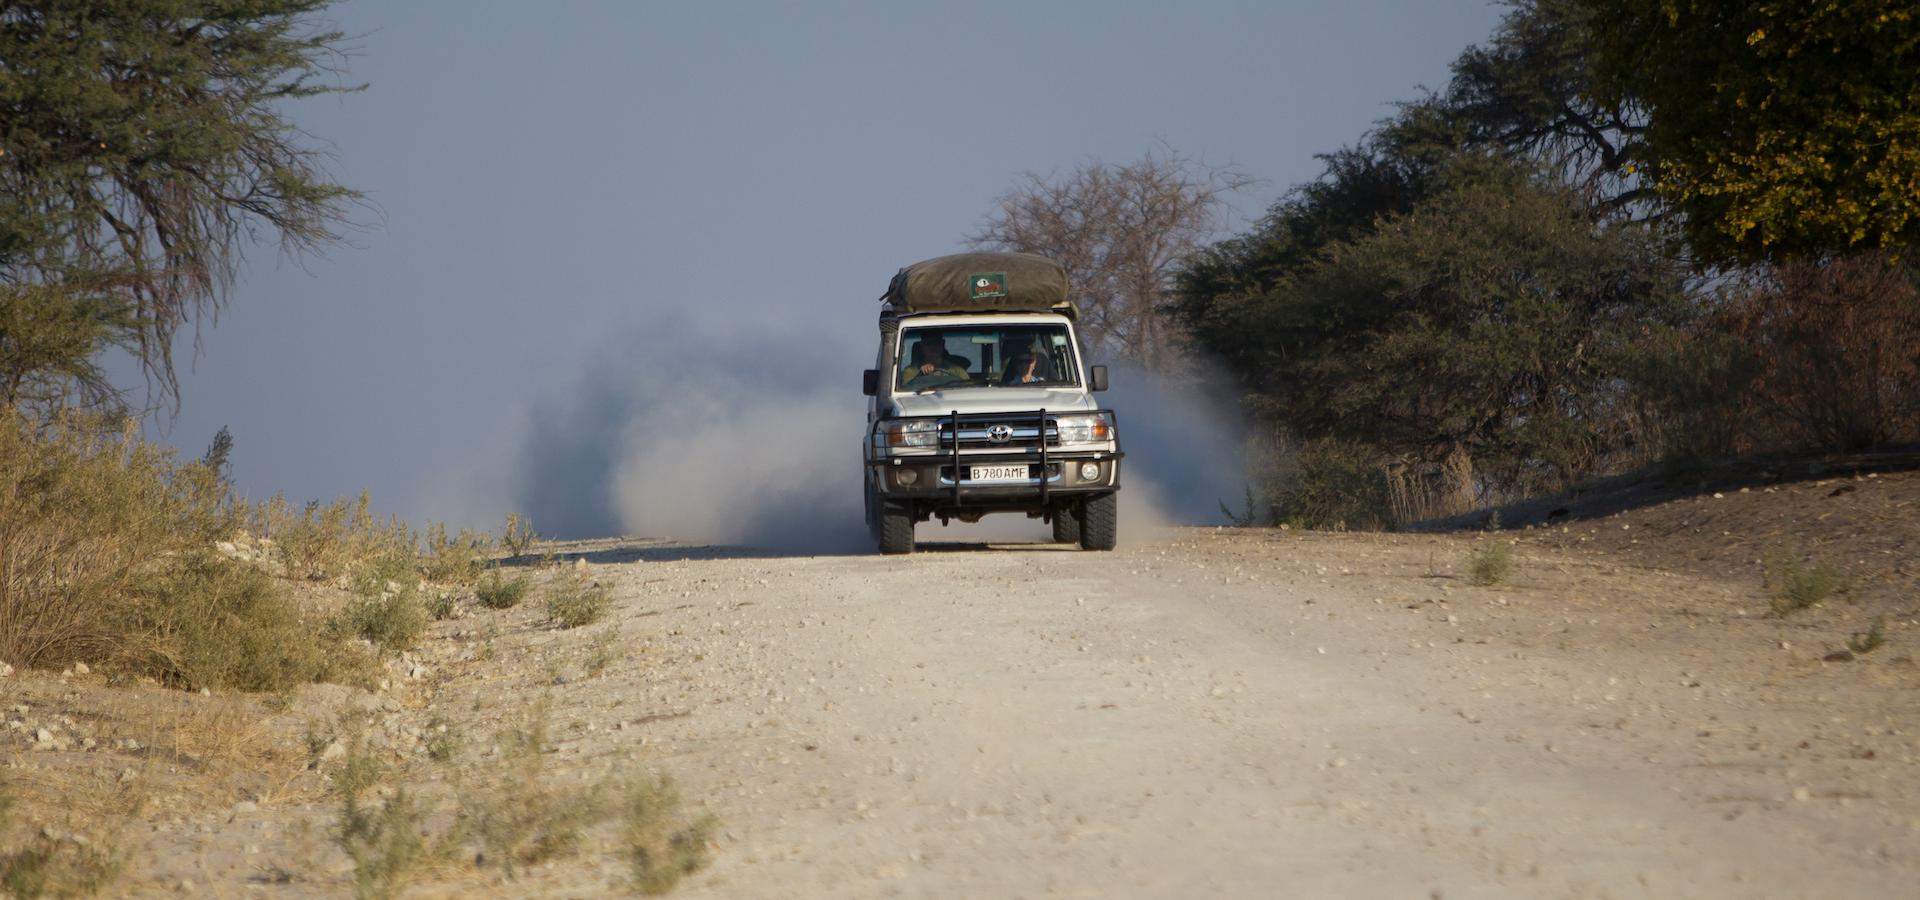 Botswana 4x4 Offroad-Adventure Offroadtour im 4x4 Fahrzeug durch Botswana und Namibia